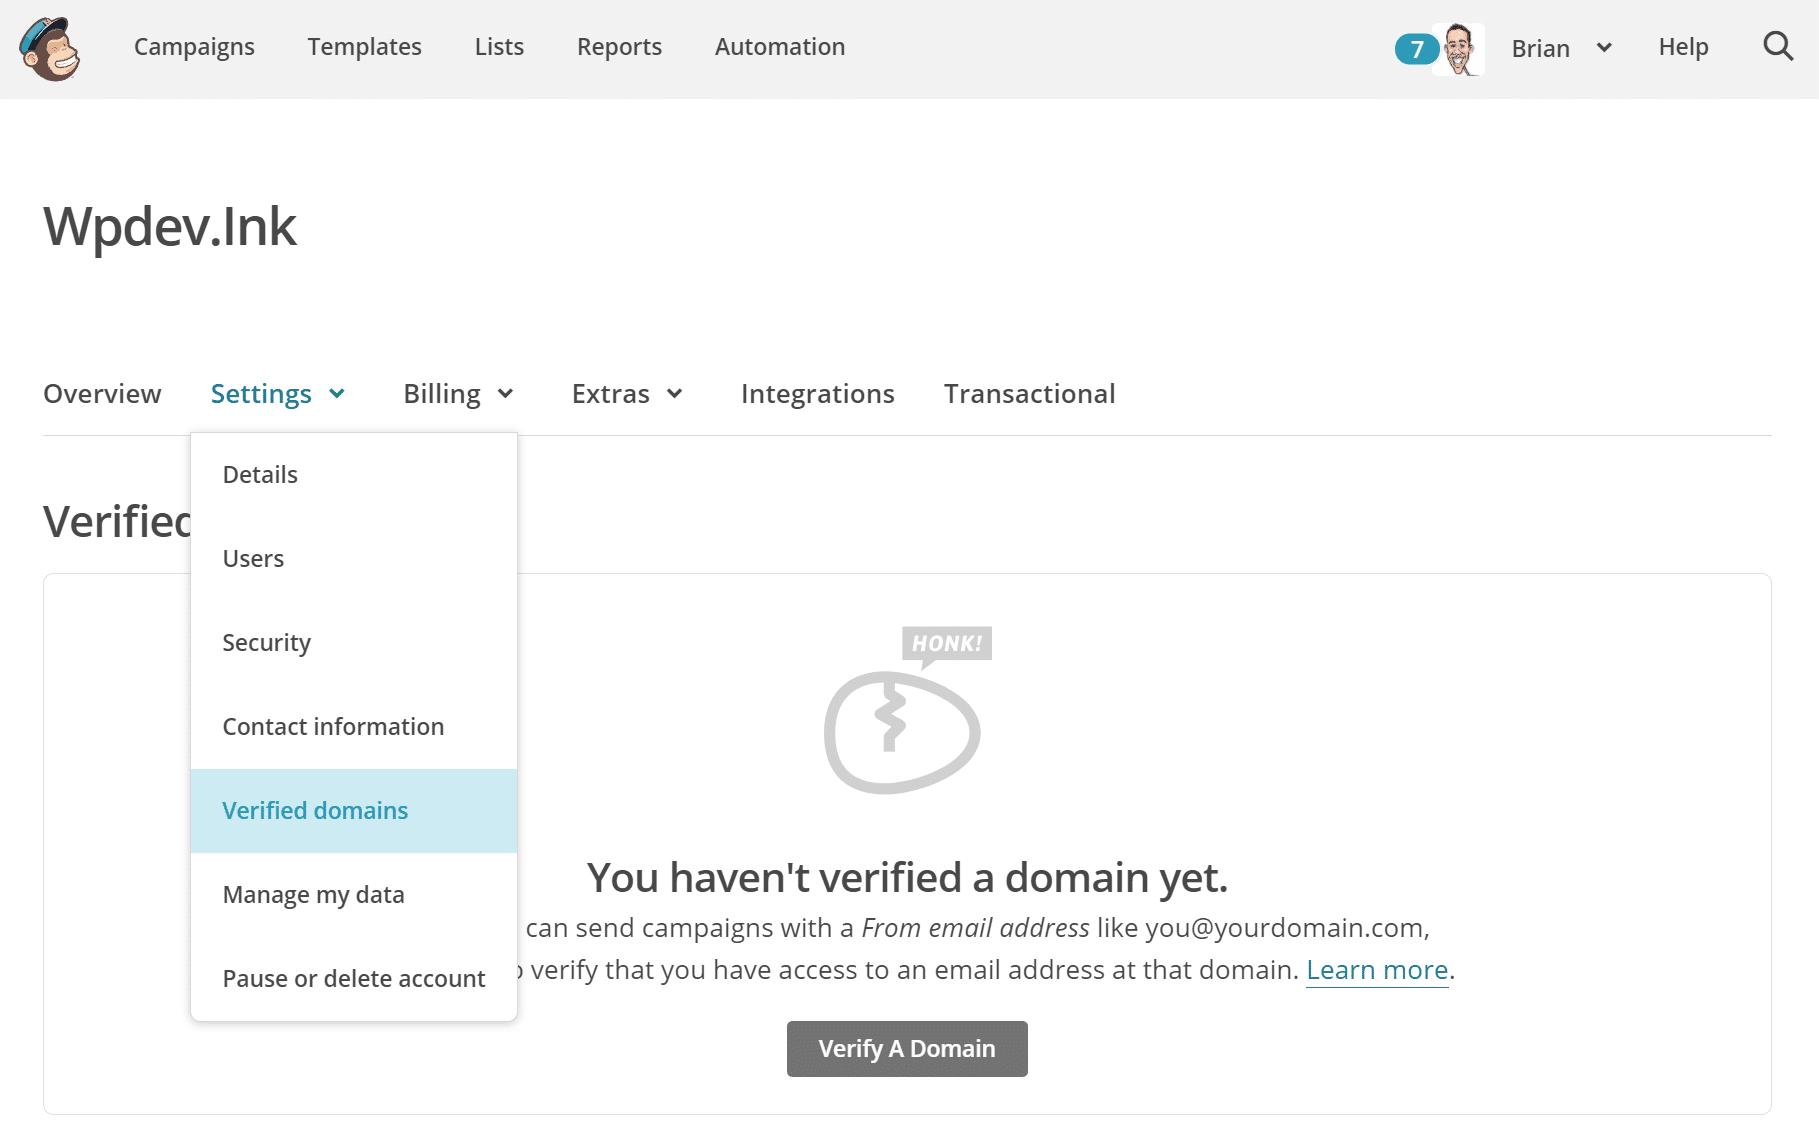 Domini verificati in MailChimp